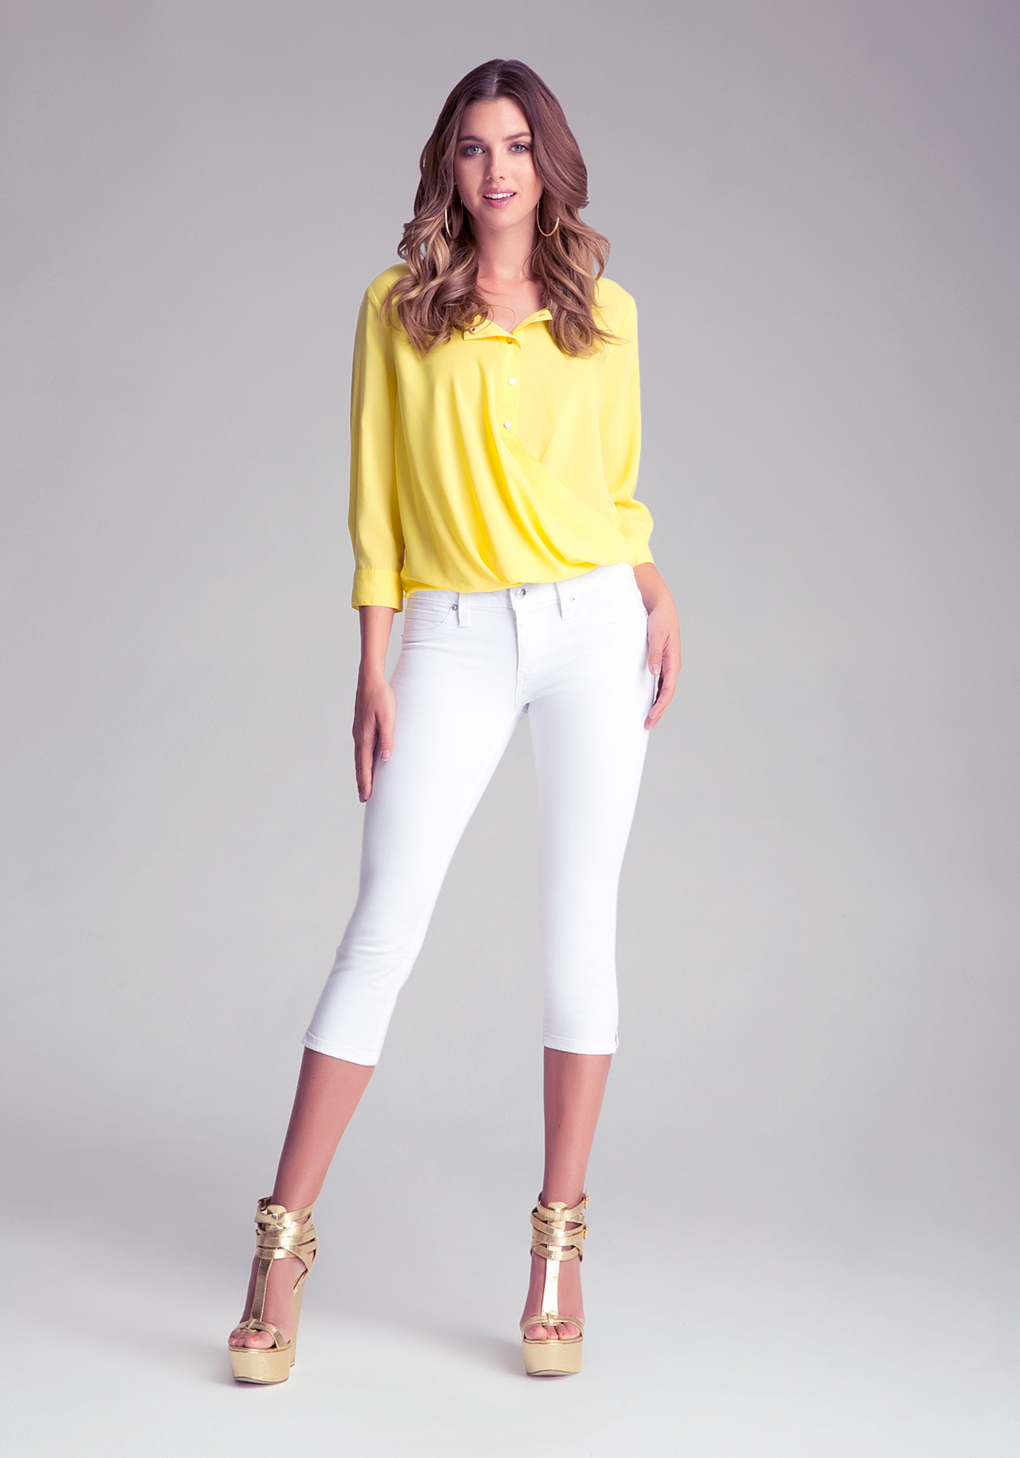 Bebe Side Slit Capri Jeans in White   Lyst